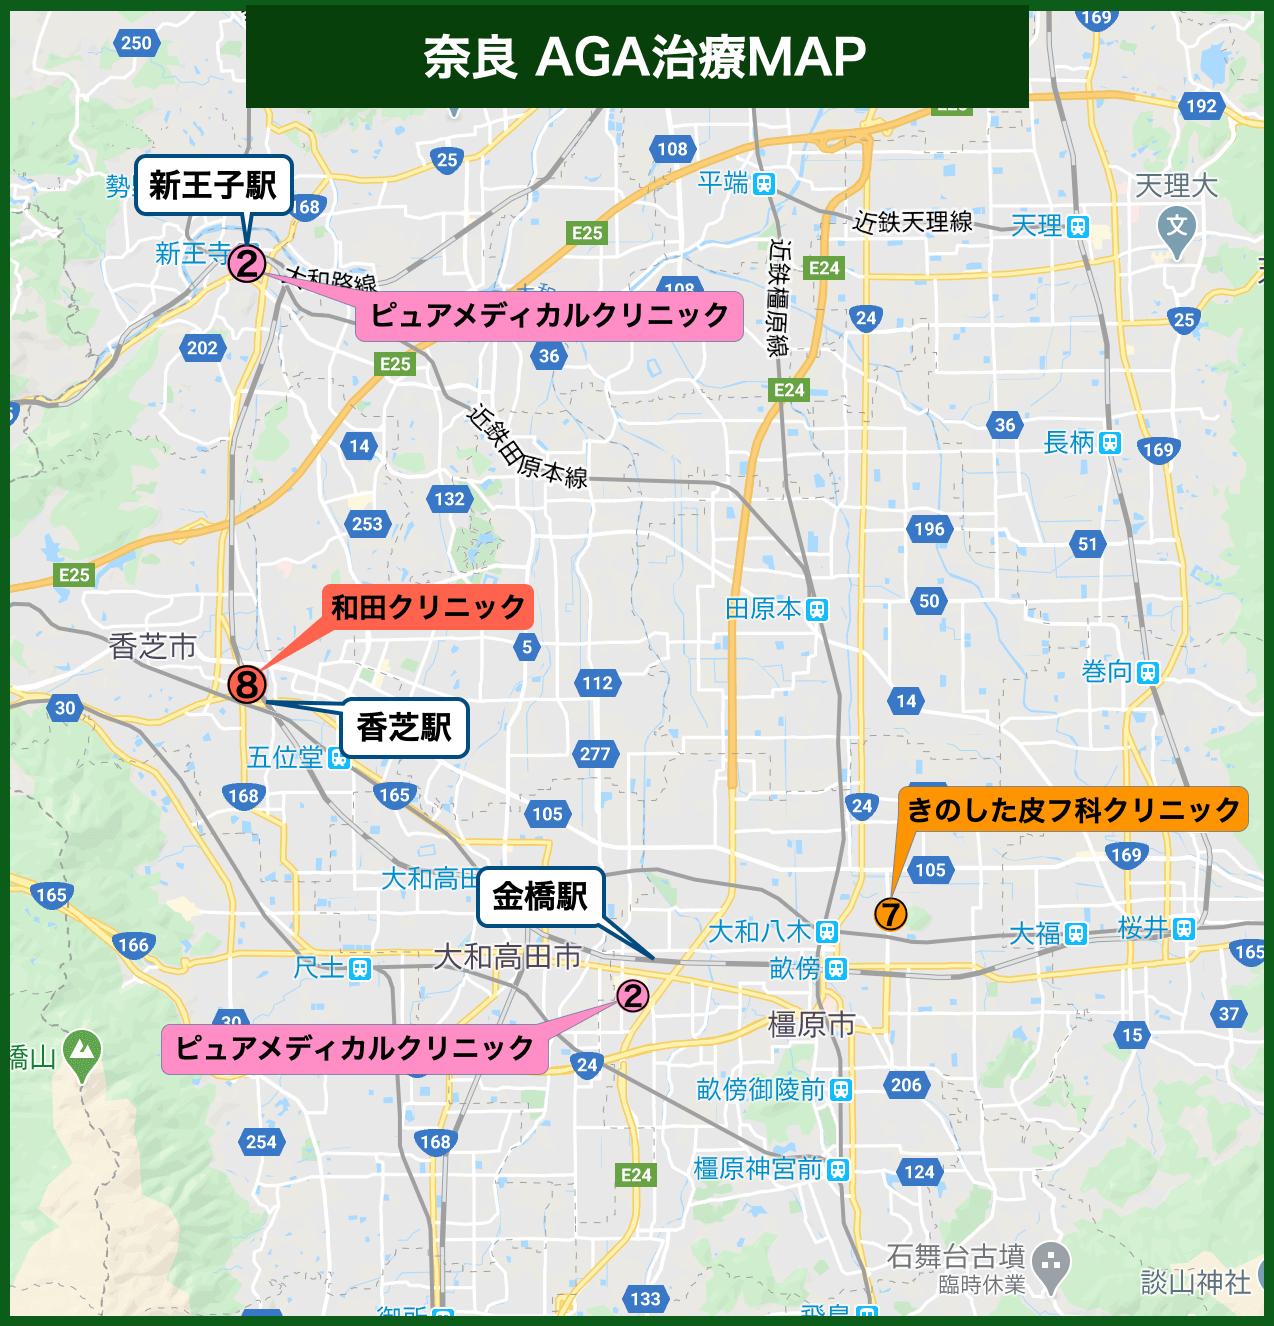 奈良 AGA治療MAP